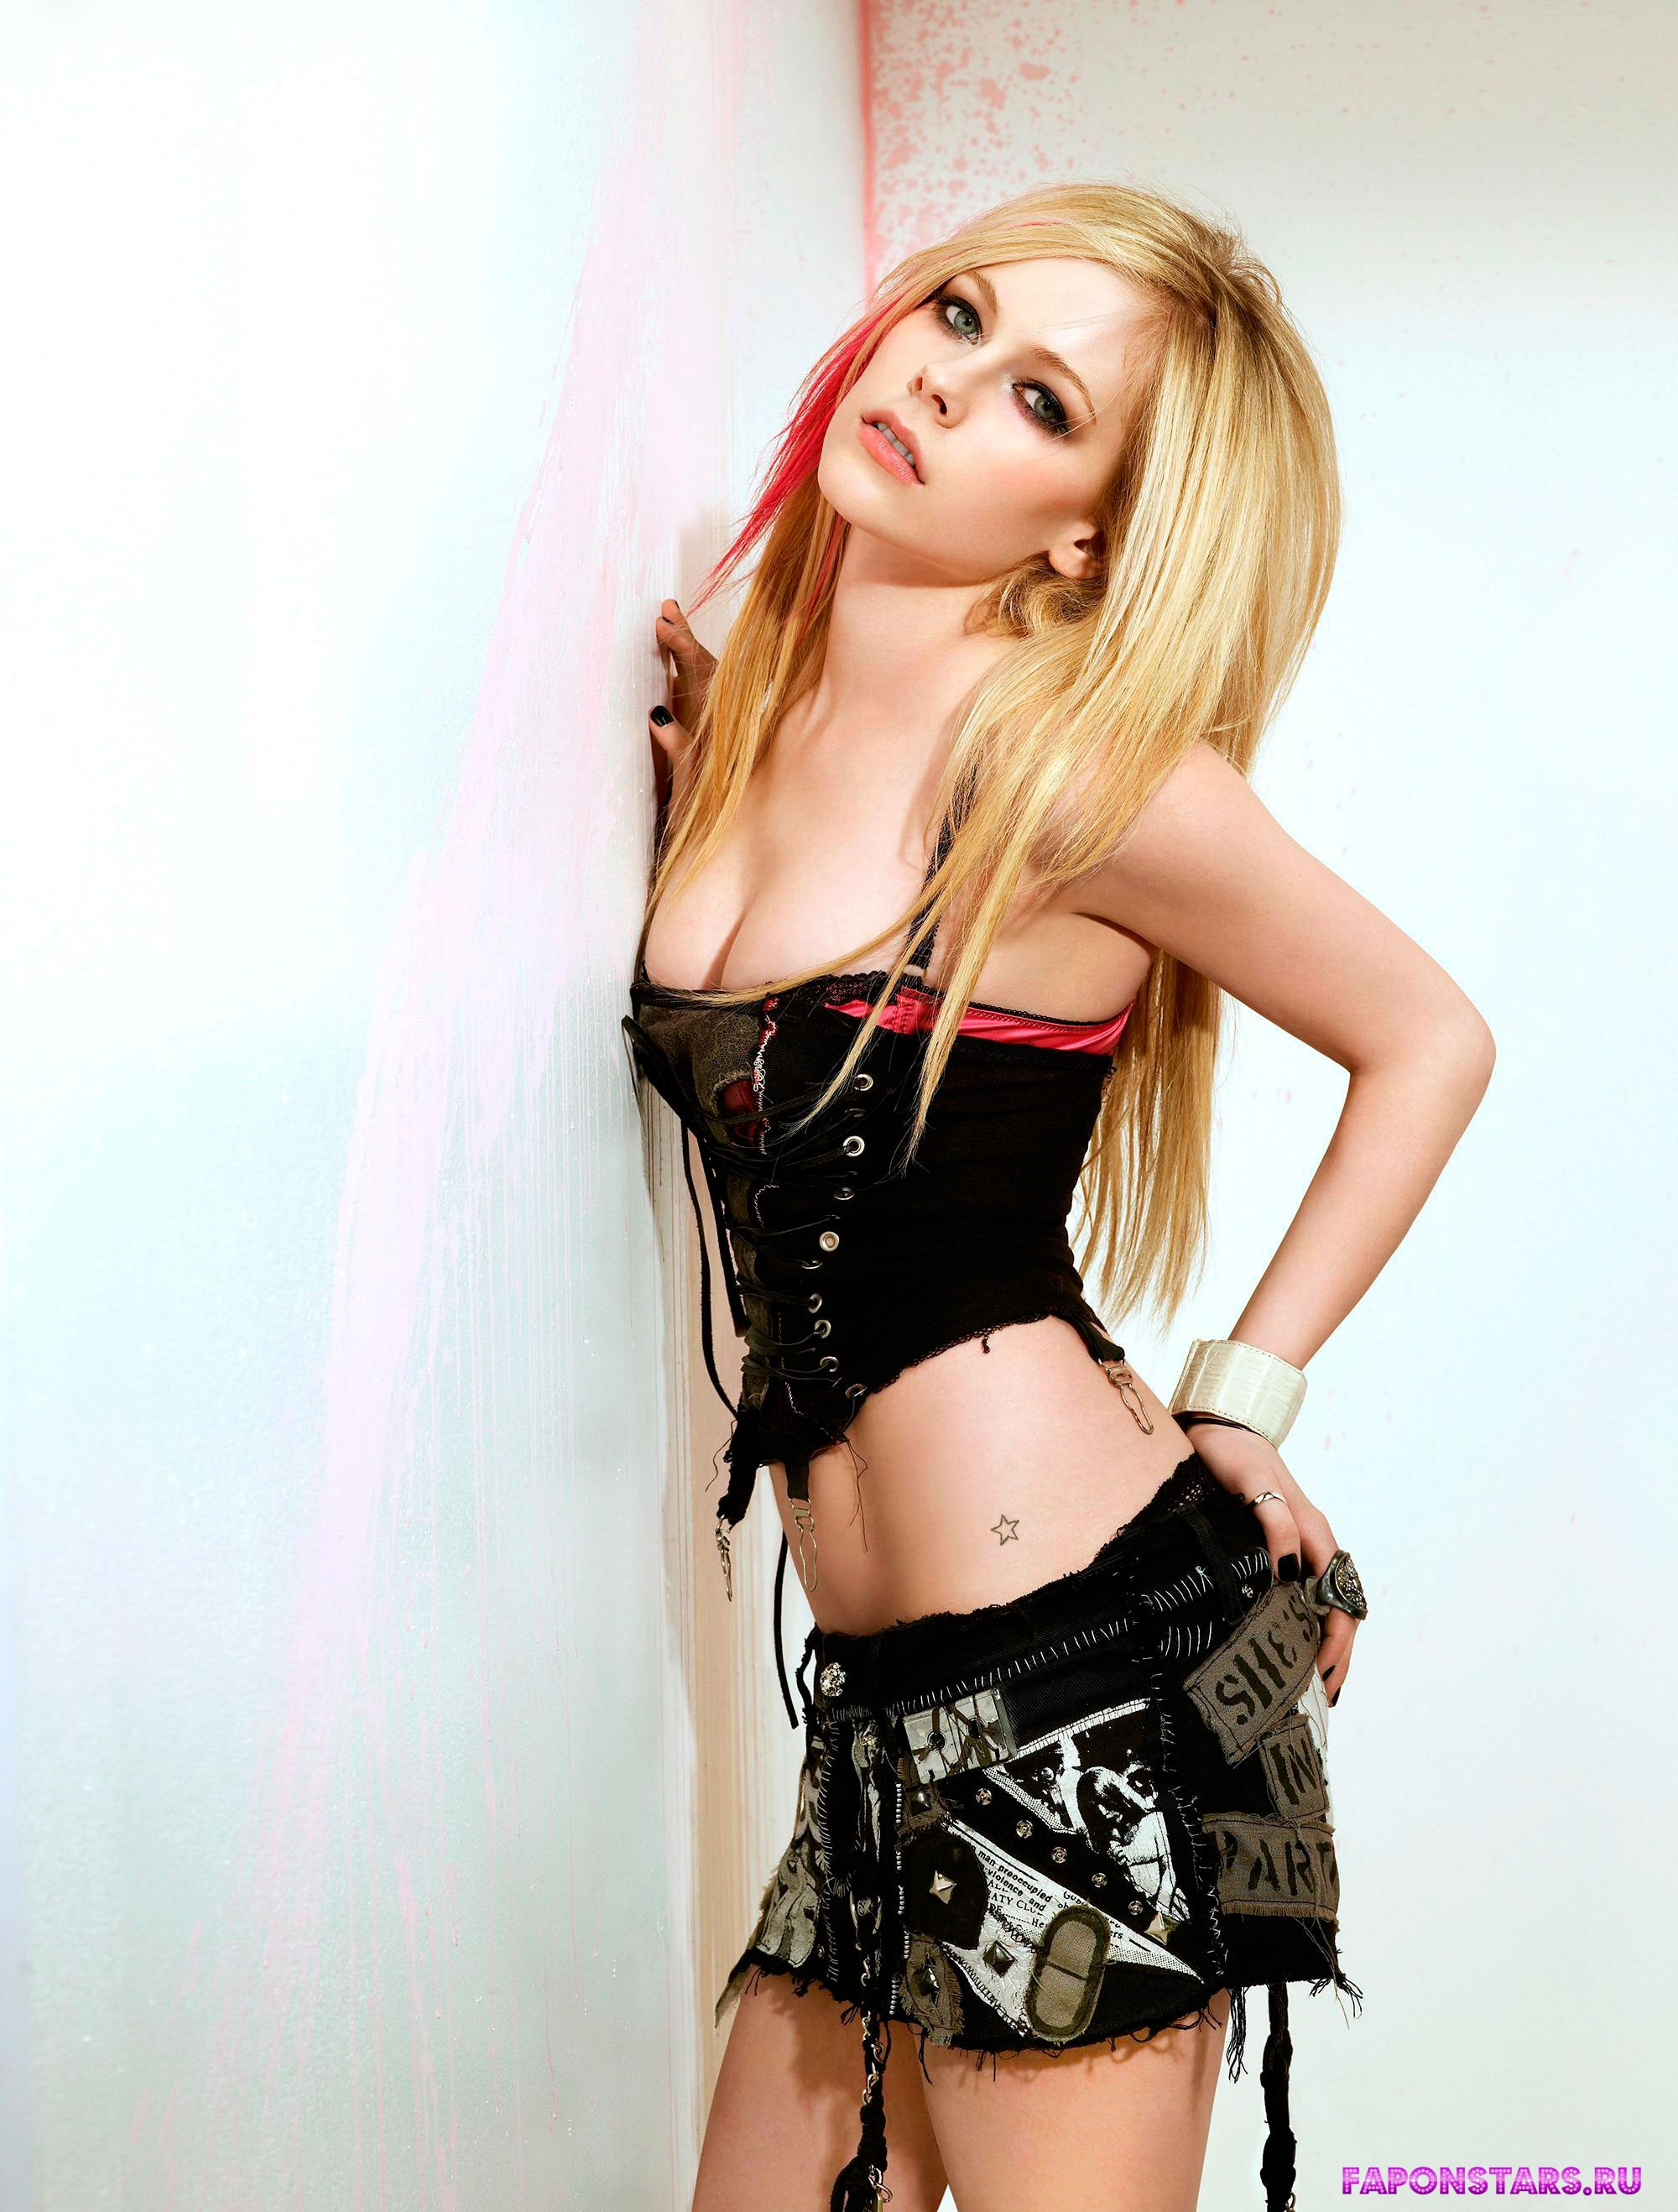 Avril Lavigne / Аврил Лавин обнаженная